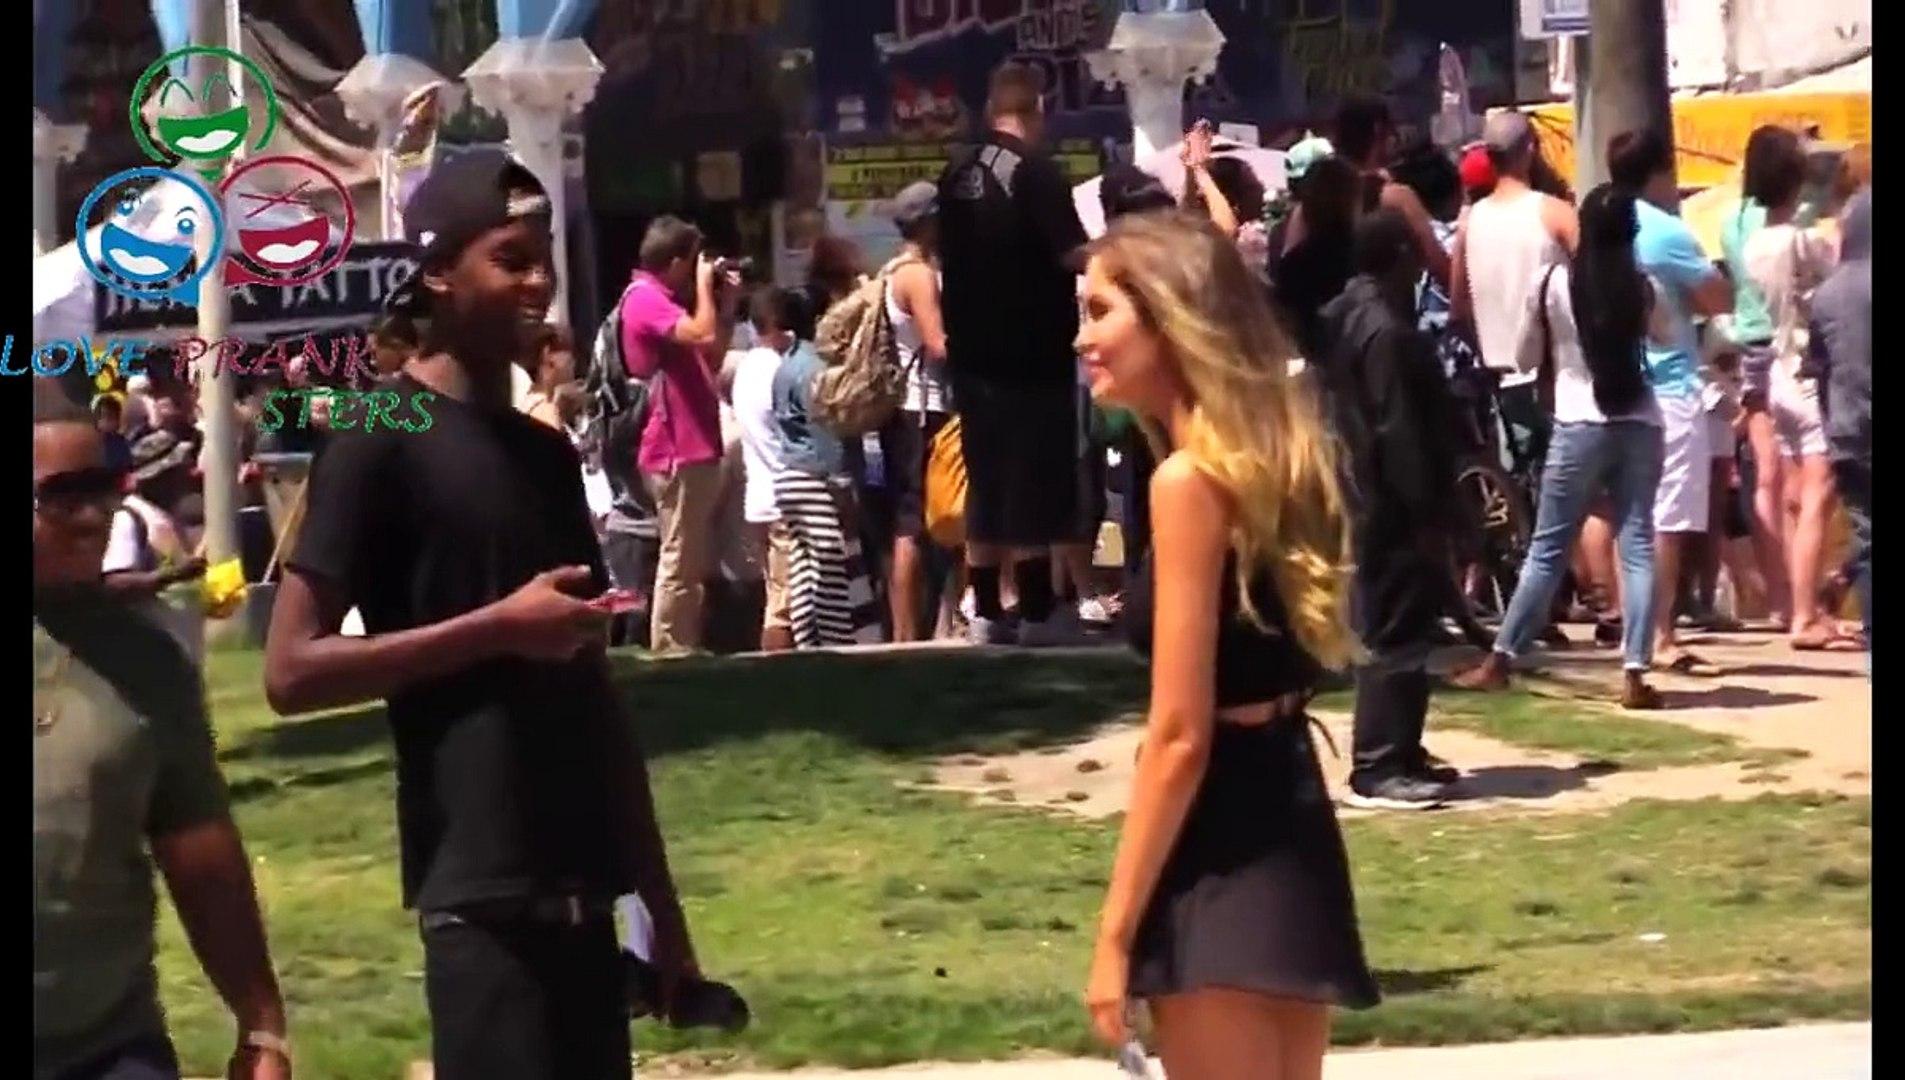 BALLS ON GIRL PRANK (PRANK GONE WROONG) - Best Bikini Pranks - Best Pranks - Funny Pranks 2015